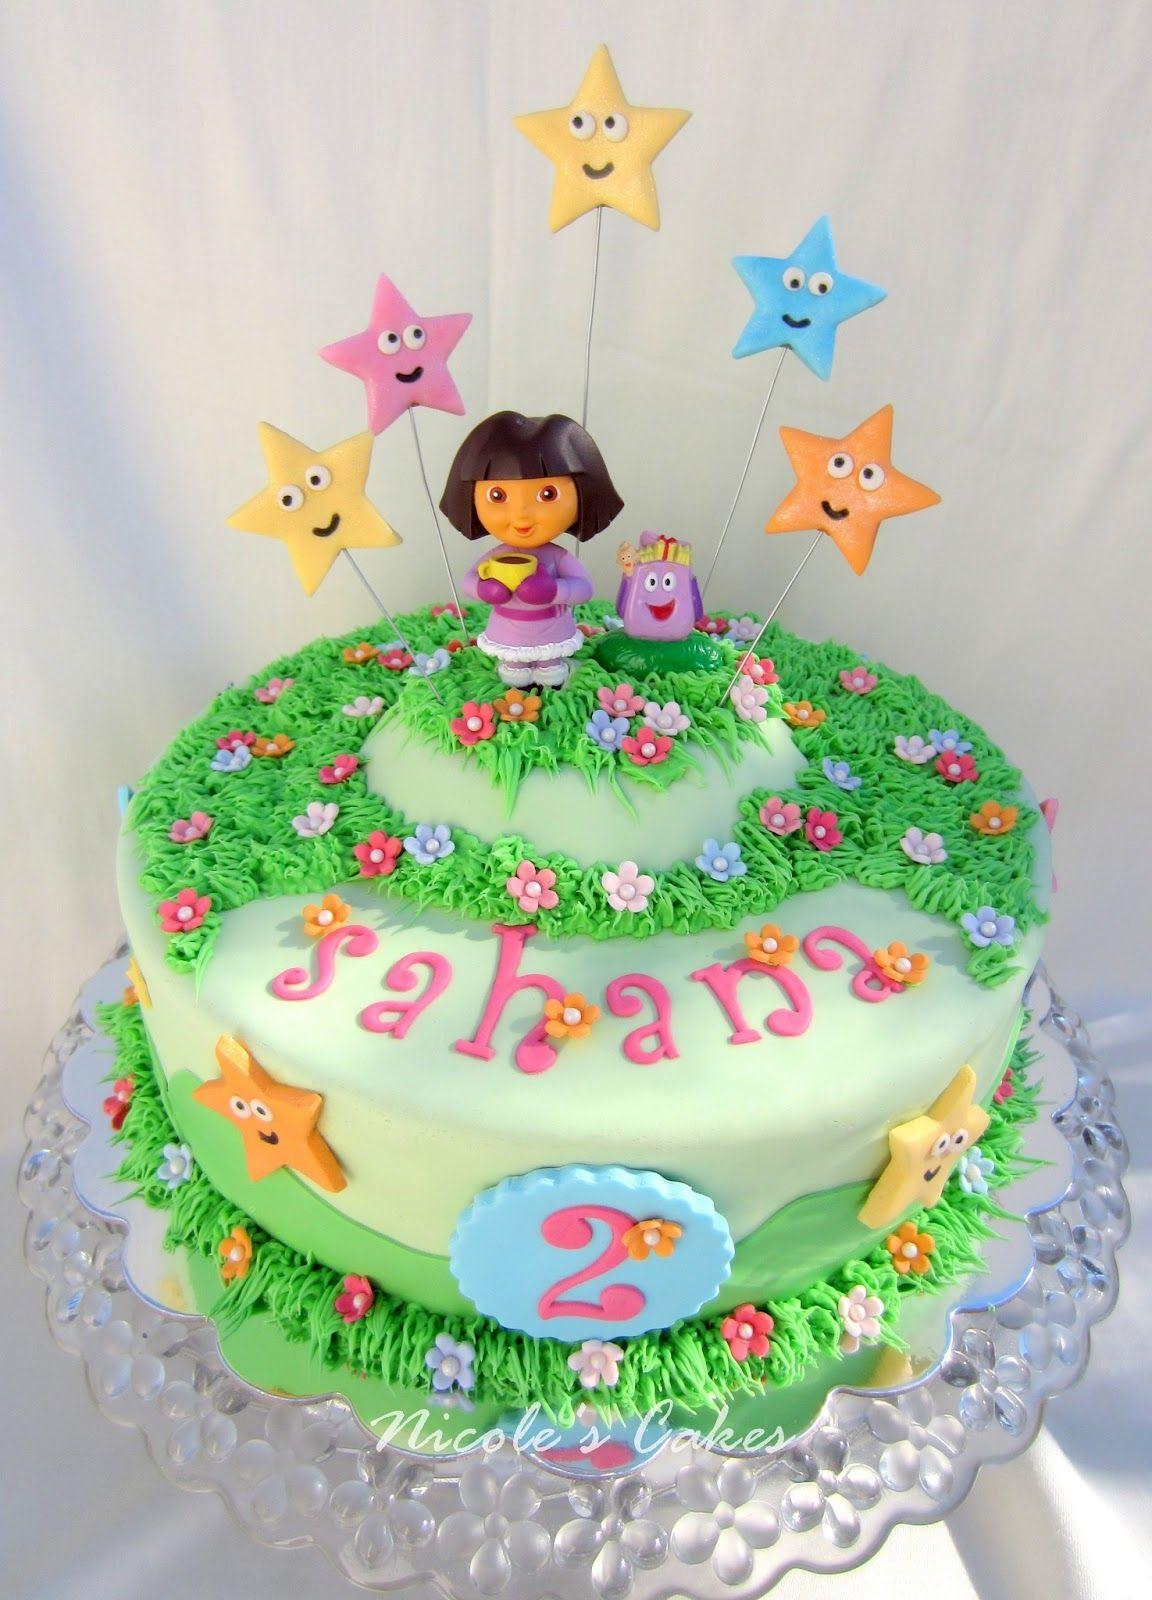 Custom Designed Birthday Cake For A Young Dora The Explorer Fan - Dora birthday cake toppers